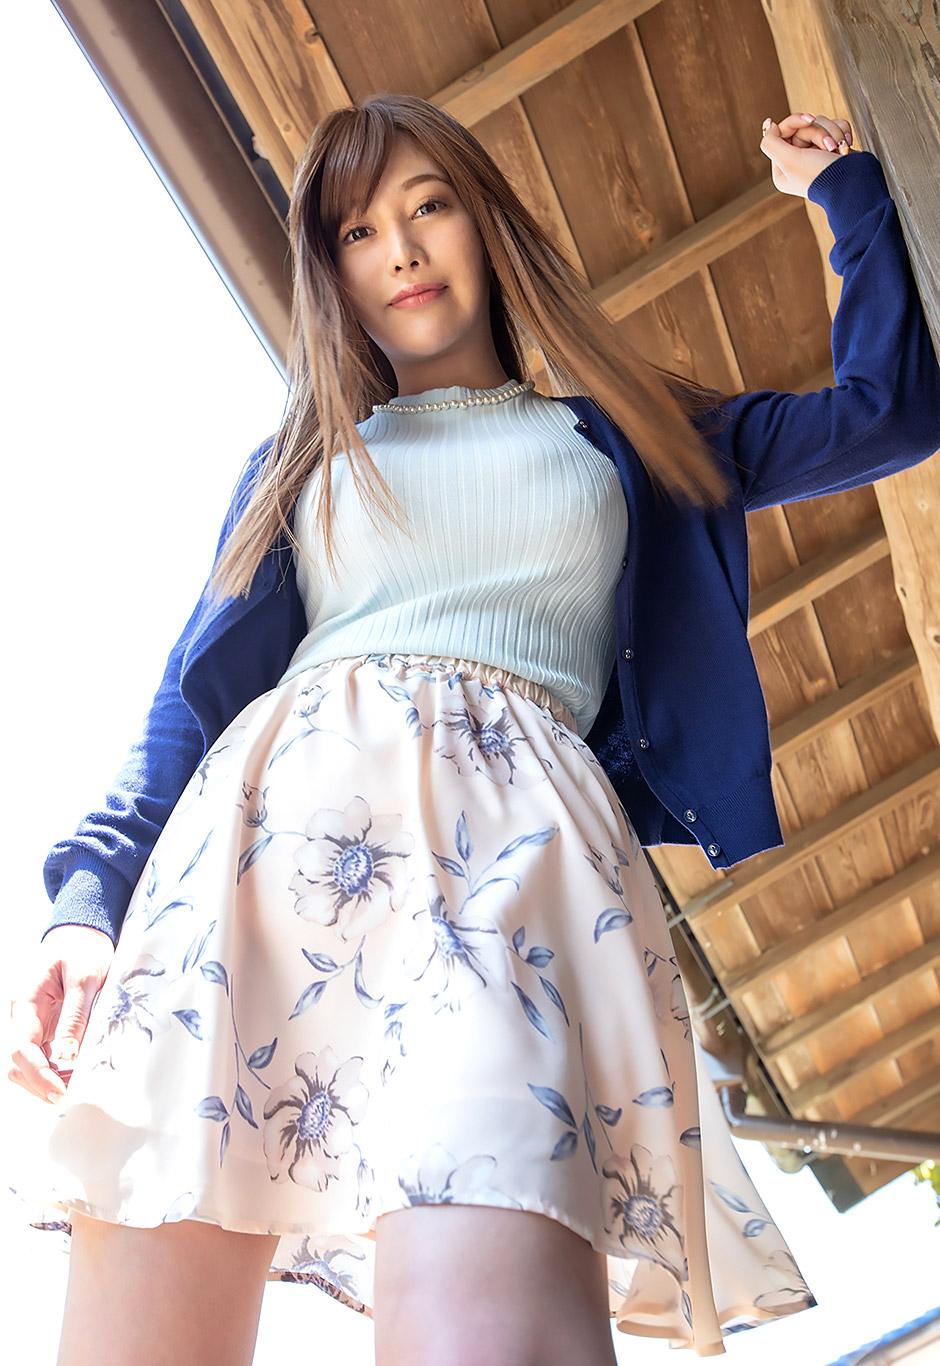 image http://scanlover.com/assets/images/272-KzarqO2xAJyl7ARH.jpeg